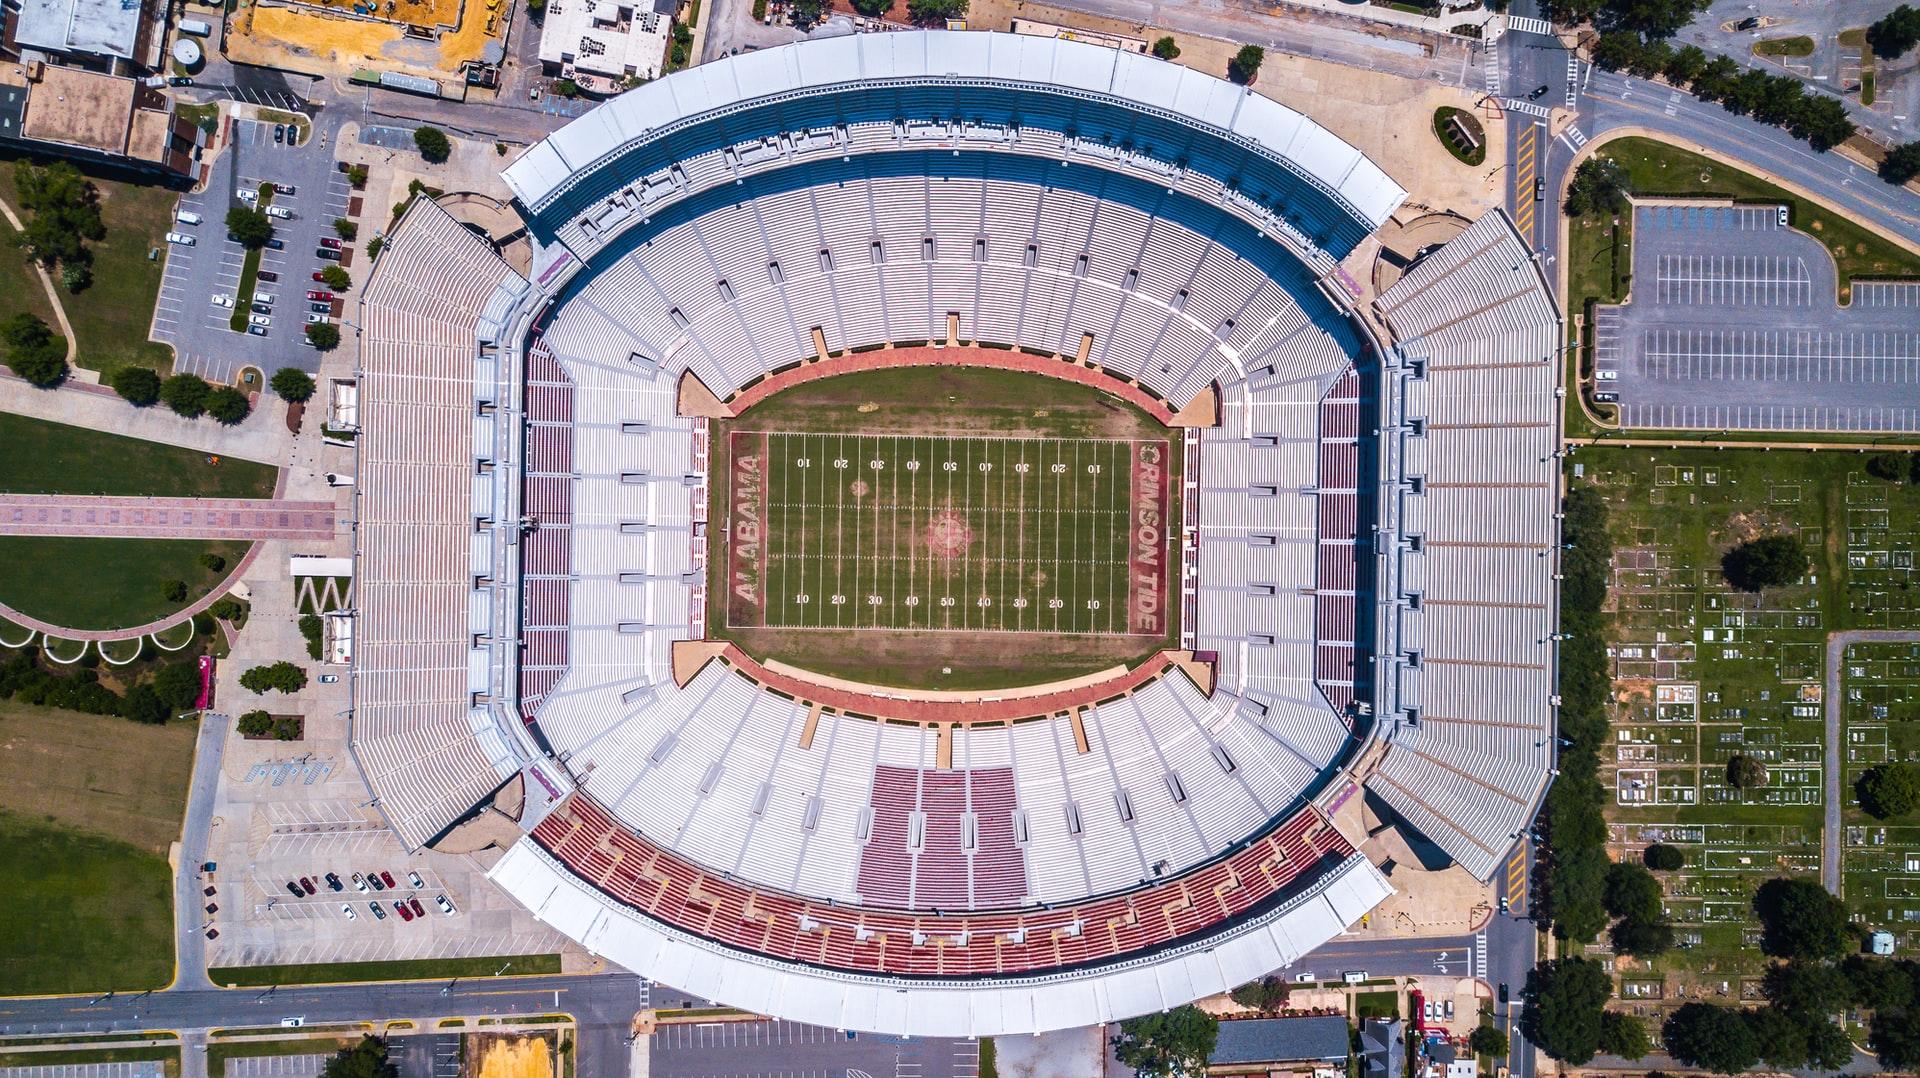 University of Alabama Crimson Tide football stadium